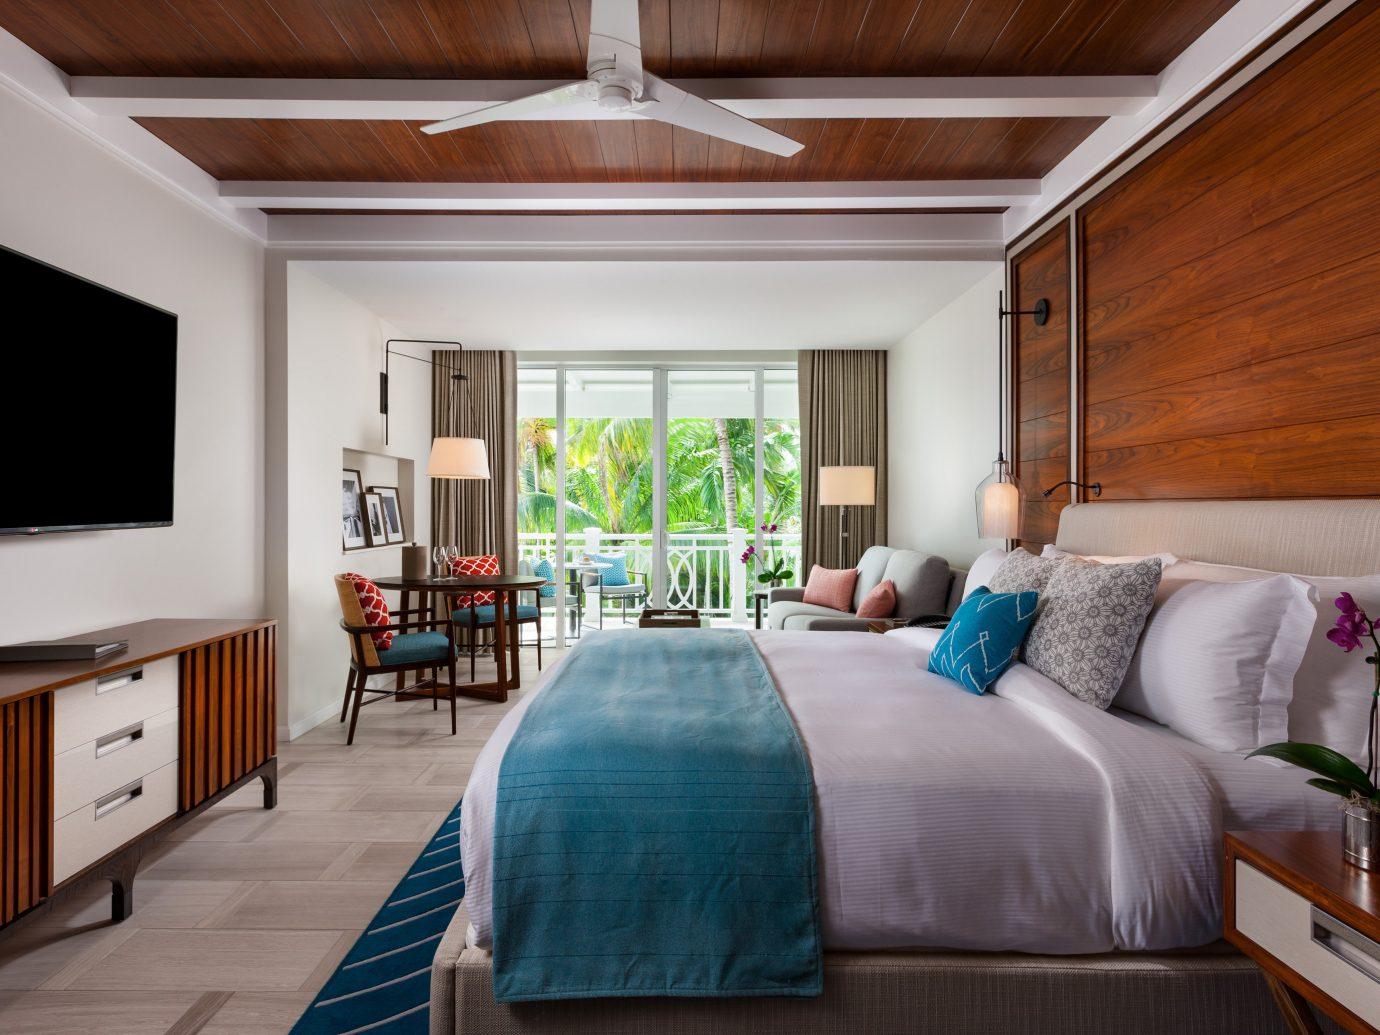 Bedroom at Four Seasons Ocean Club Bahamas